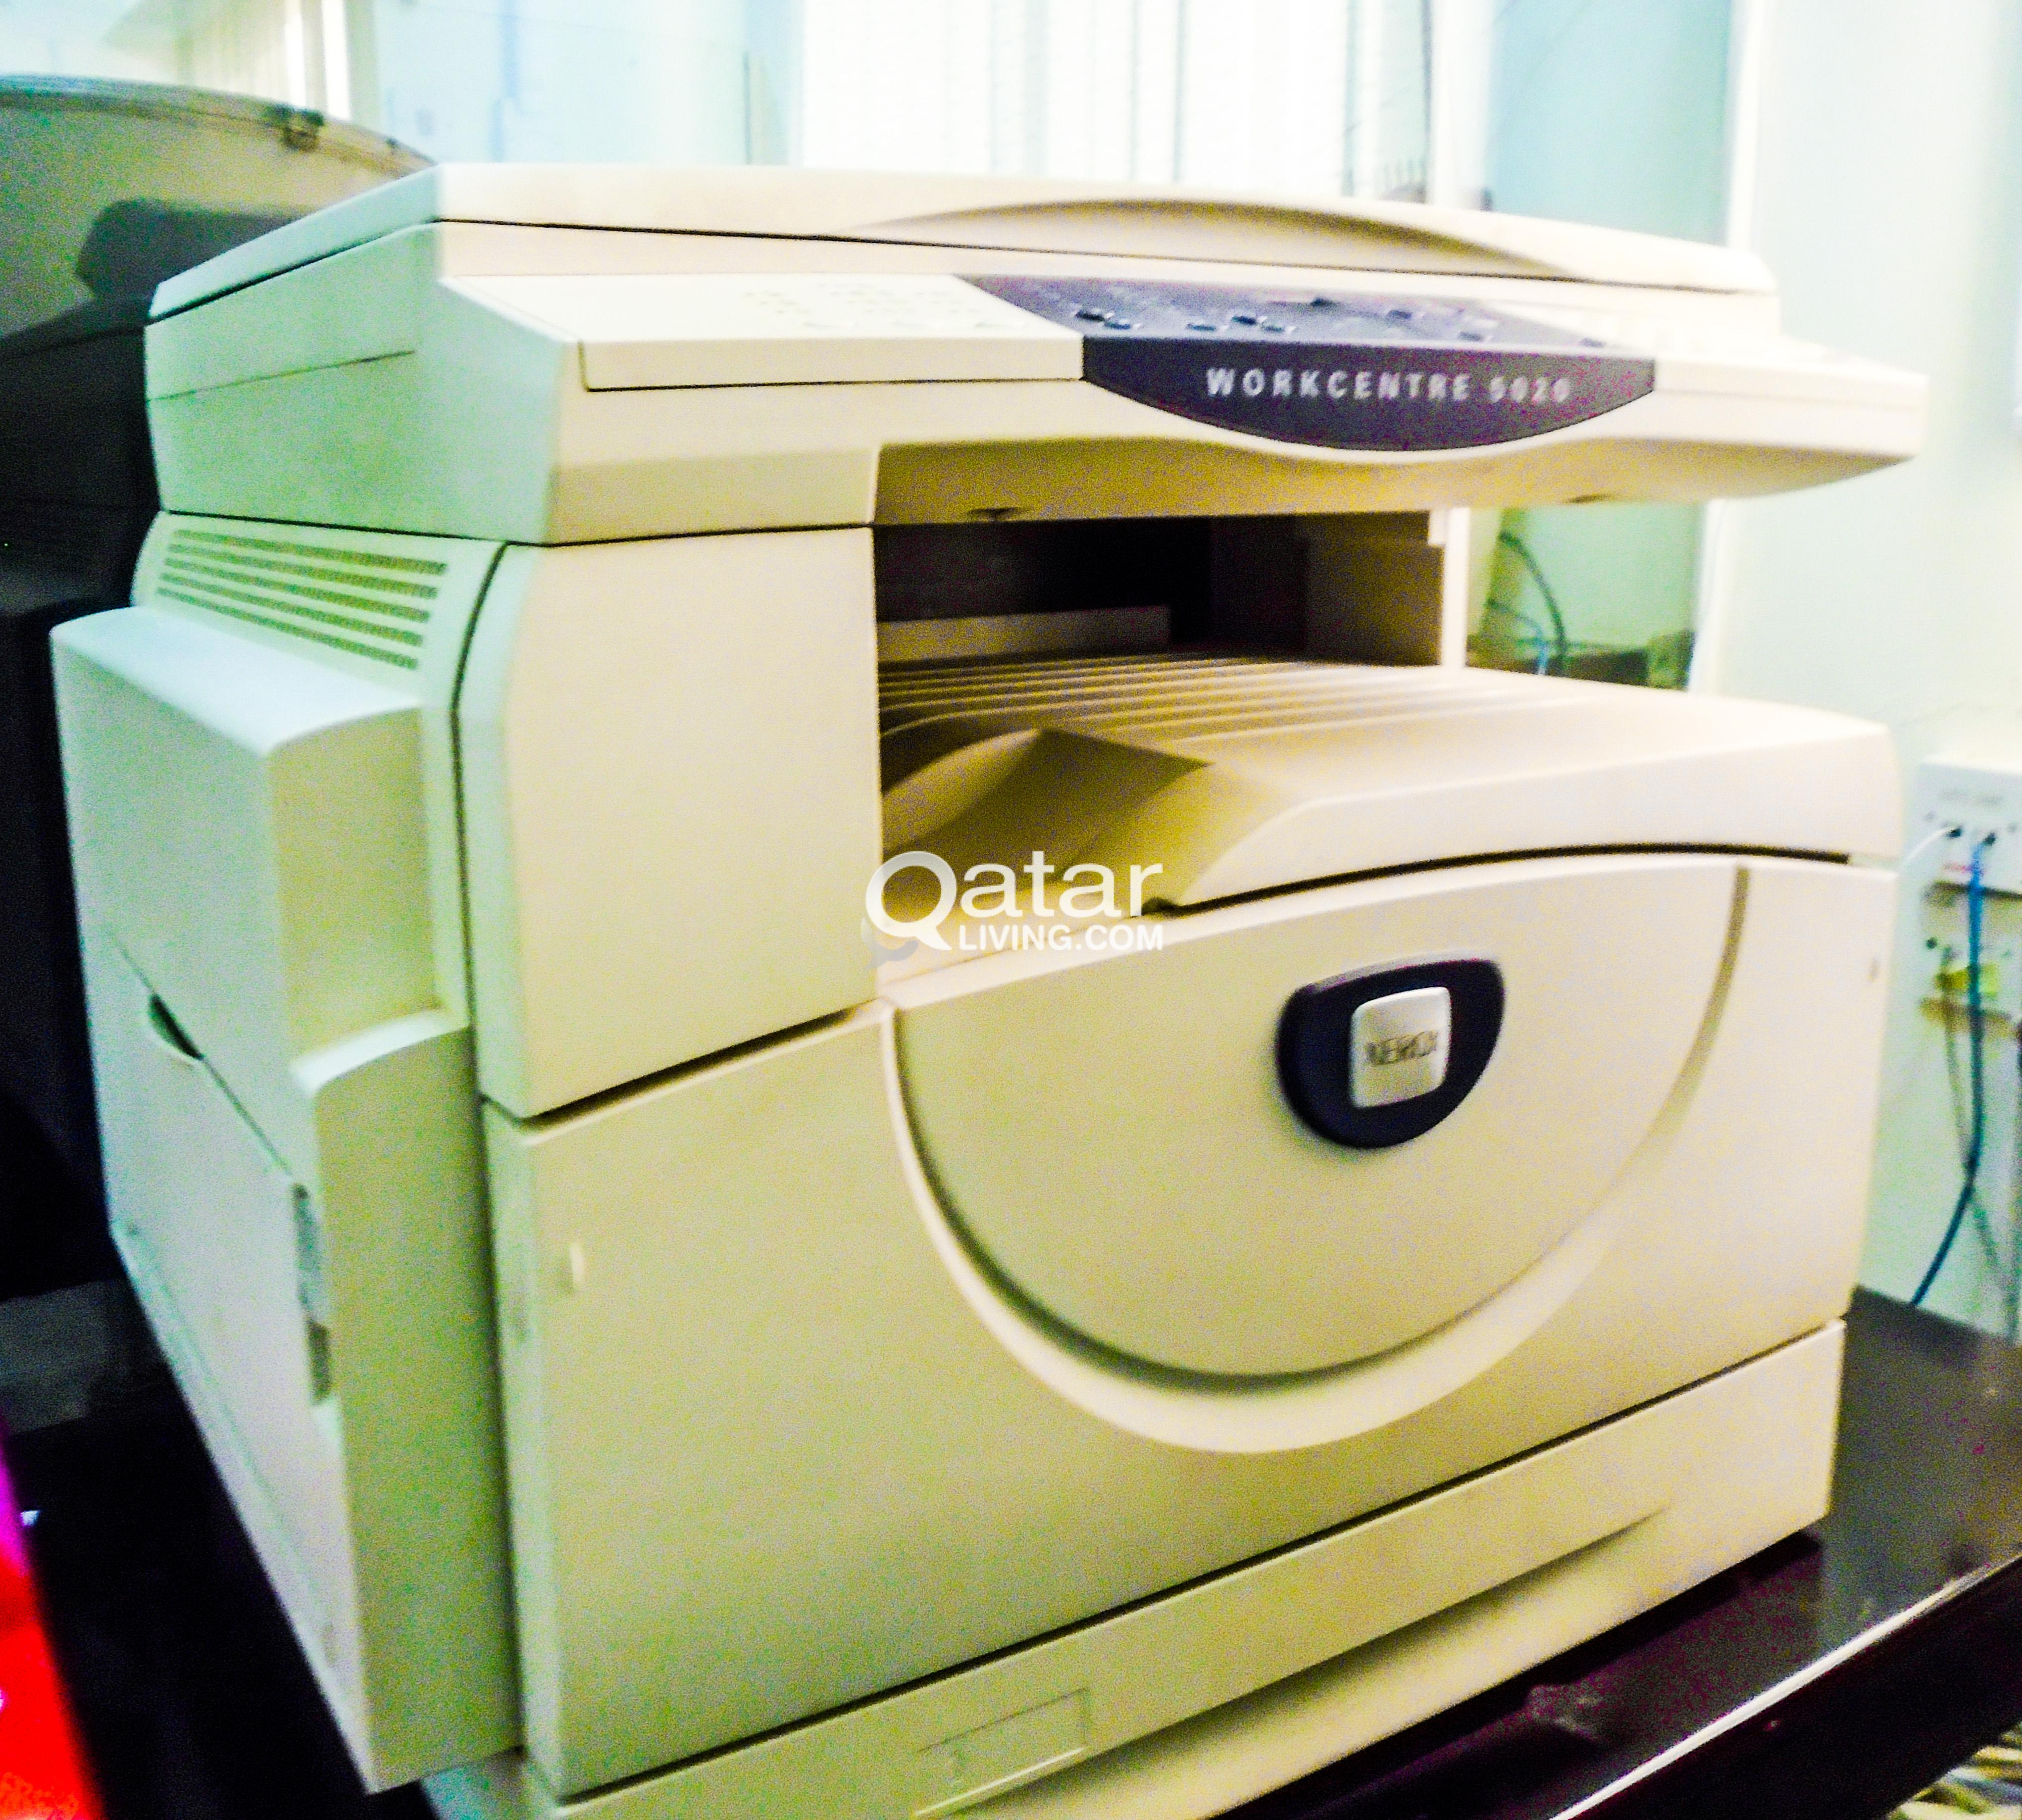 Xerox WorkCentre 5020 - multifunction printer | Qatar Living